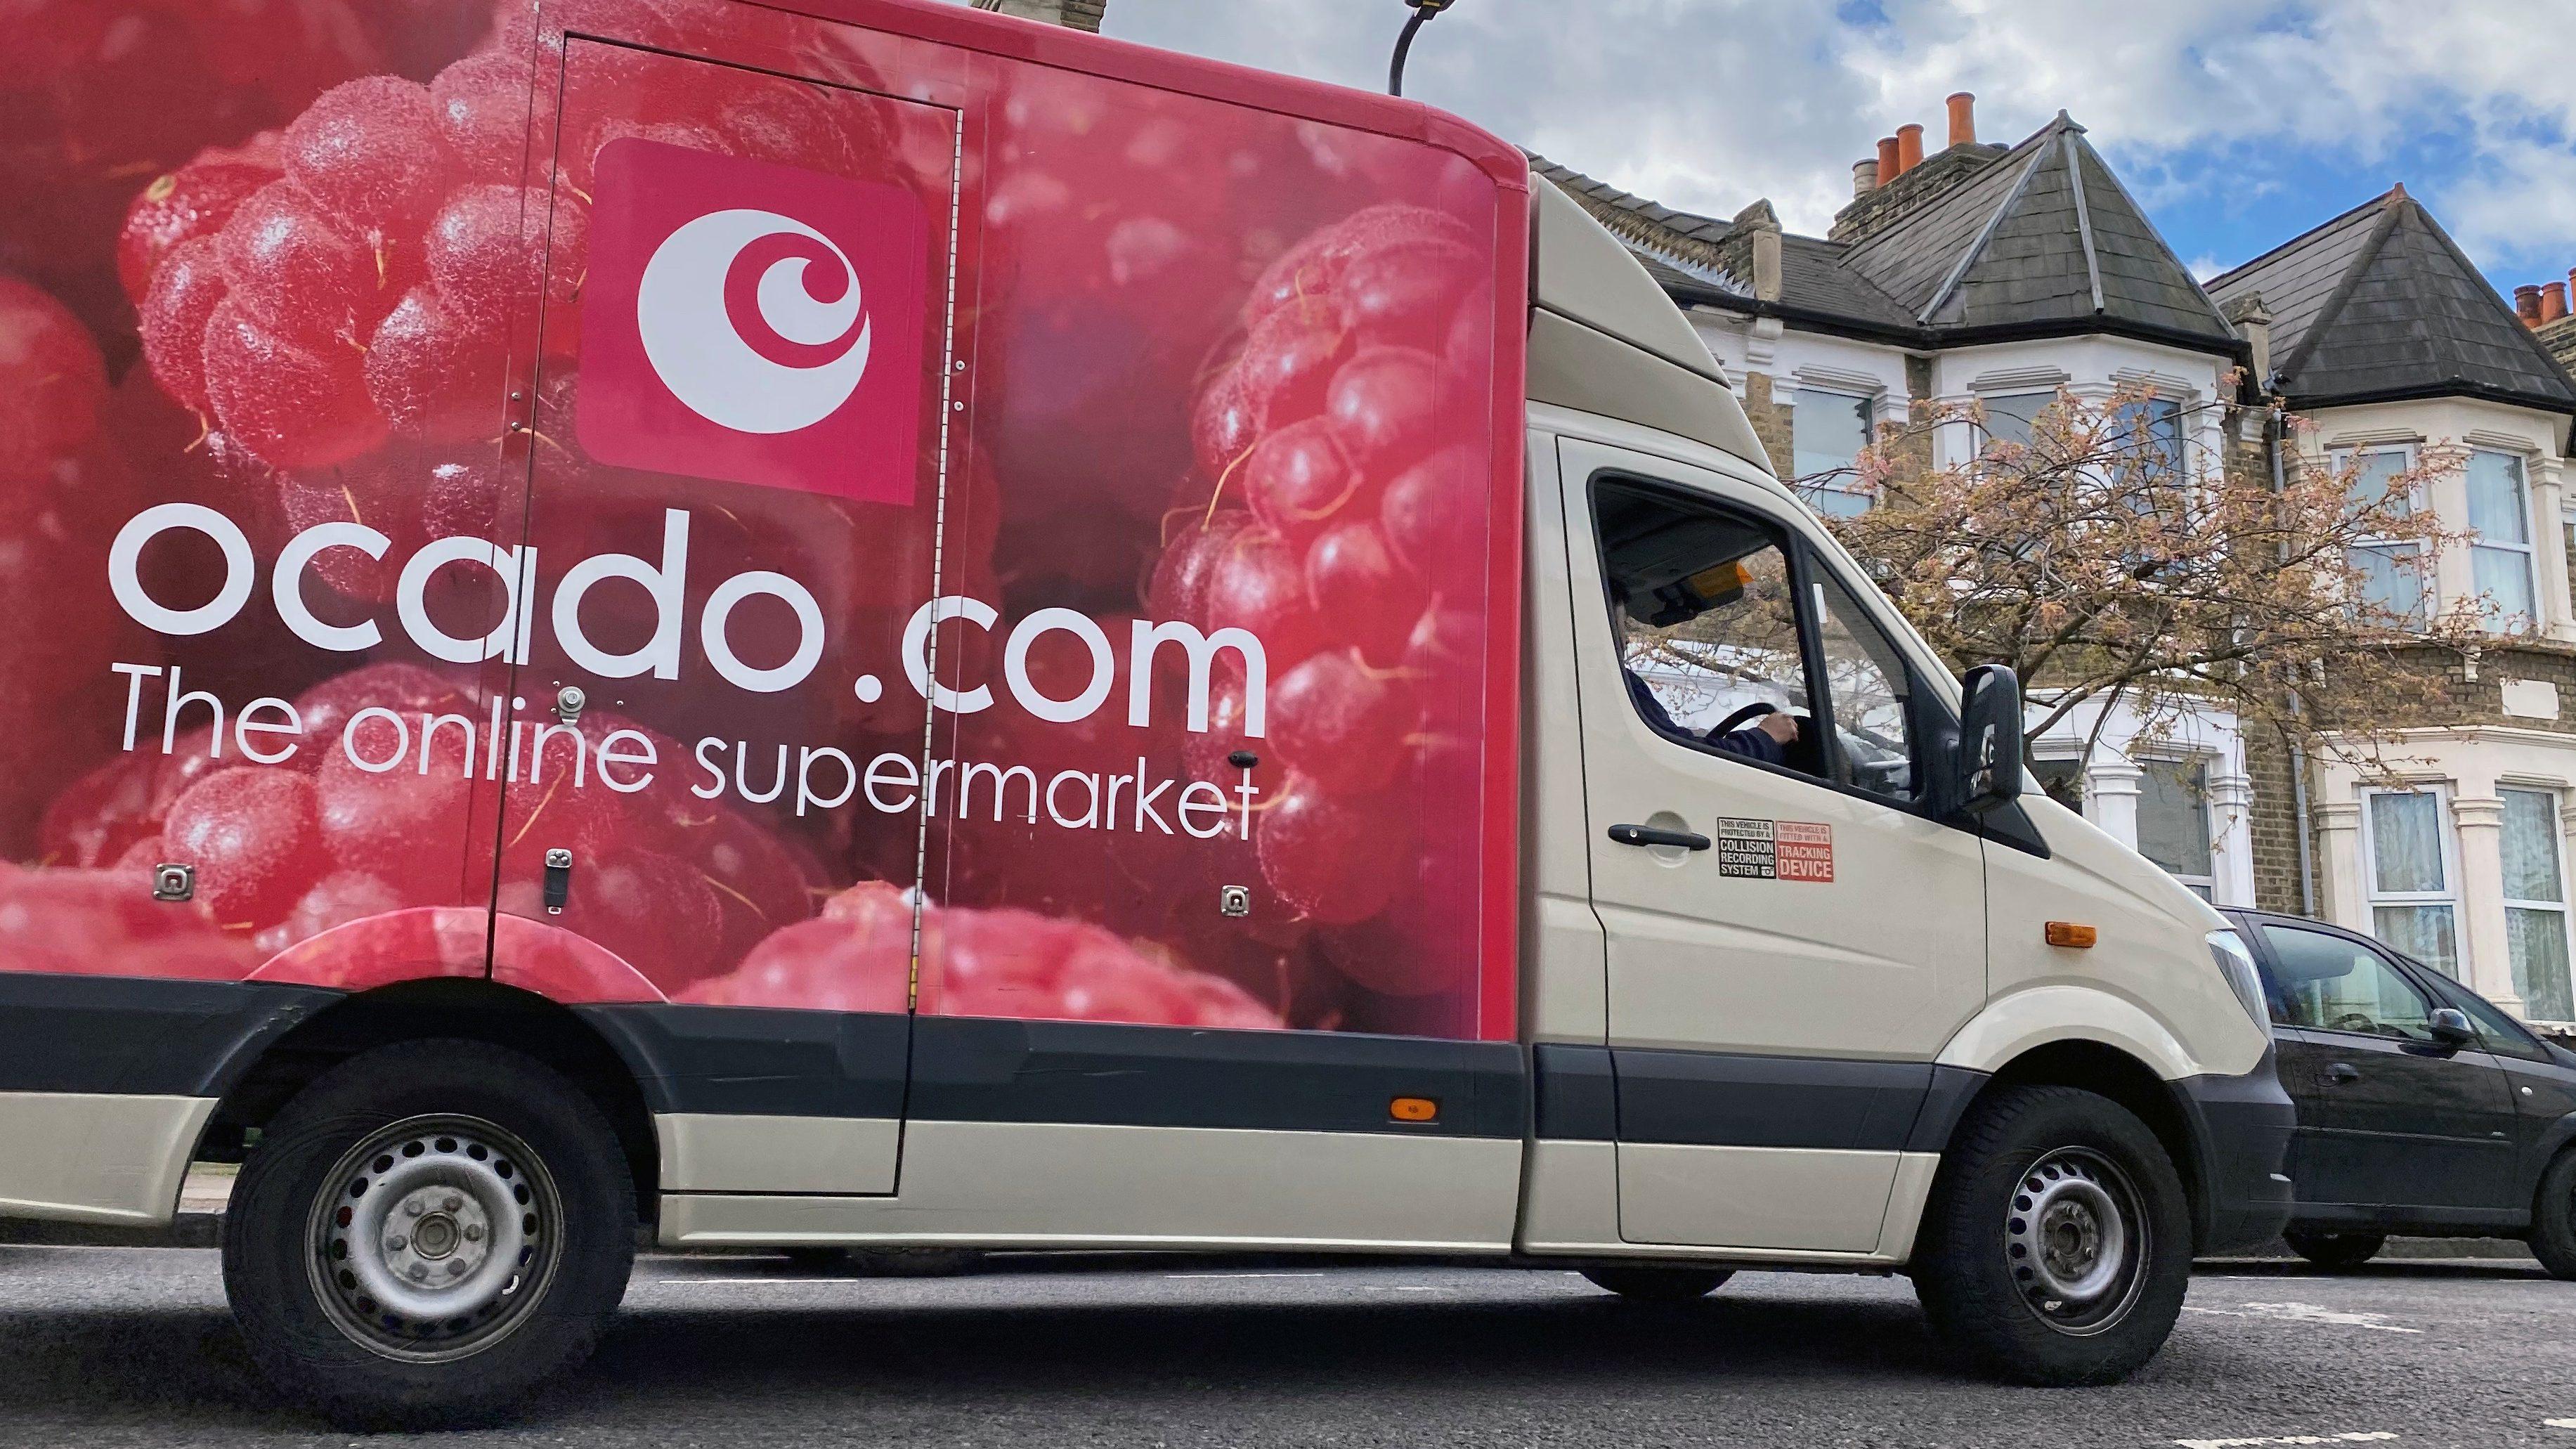 An Ocado delivery van drives down a London street.